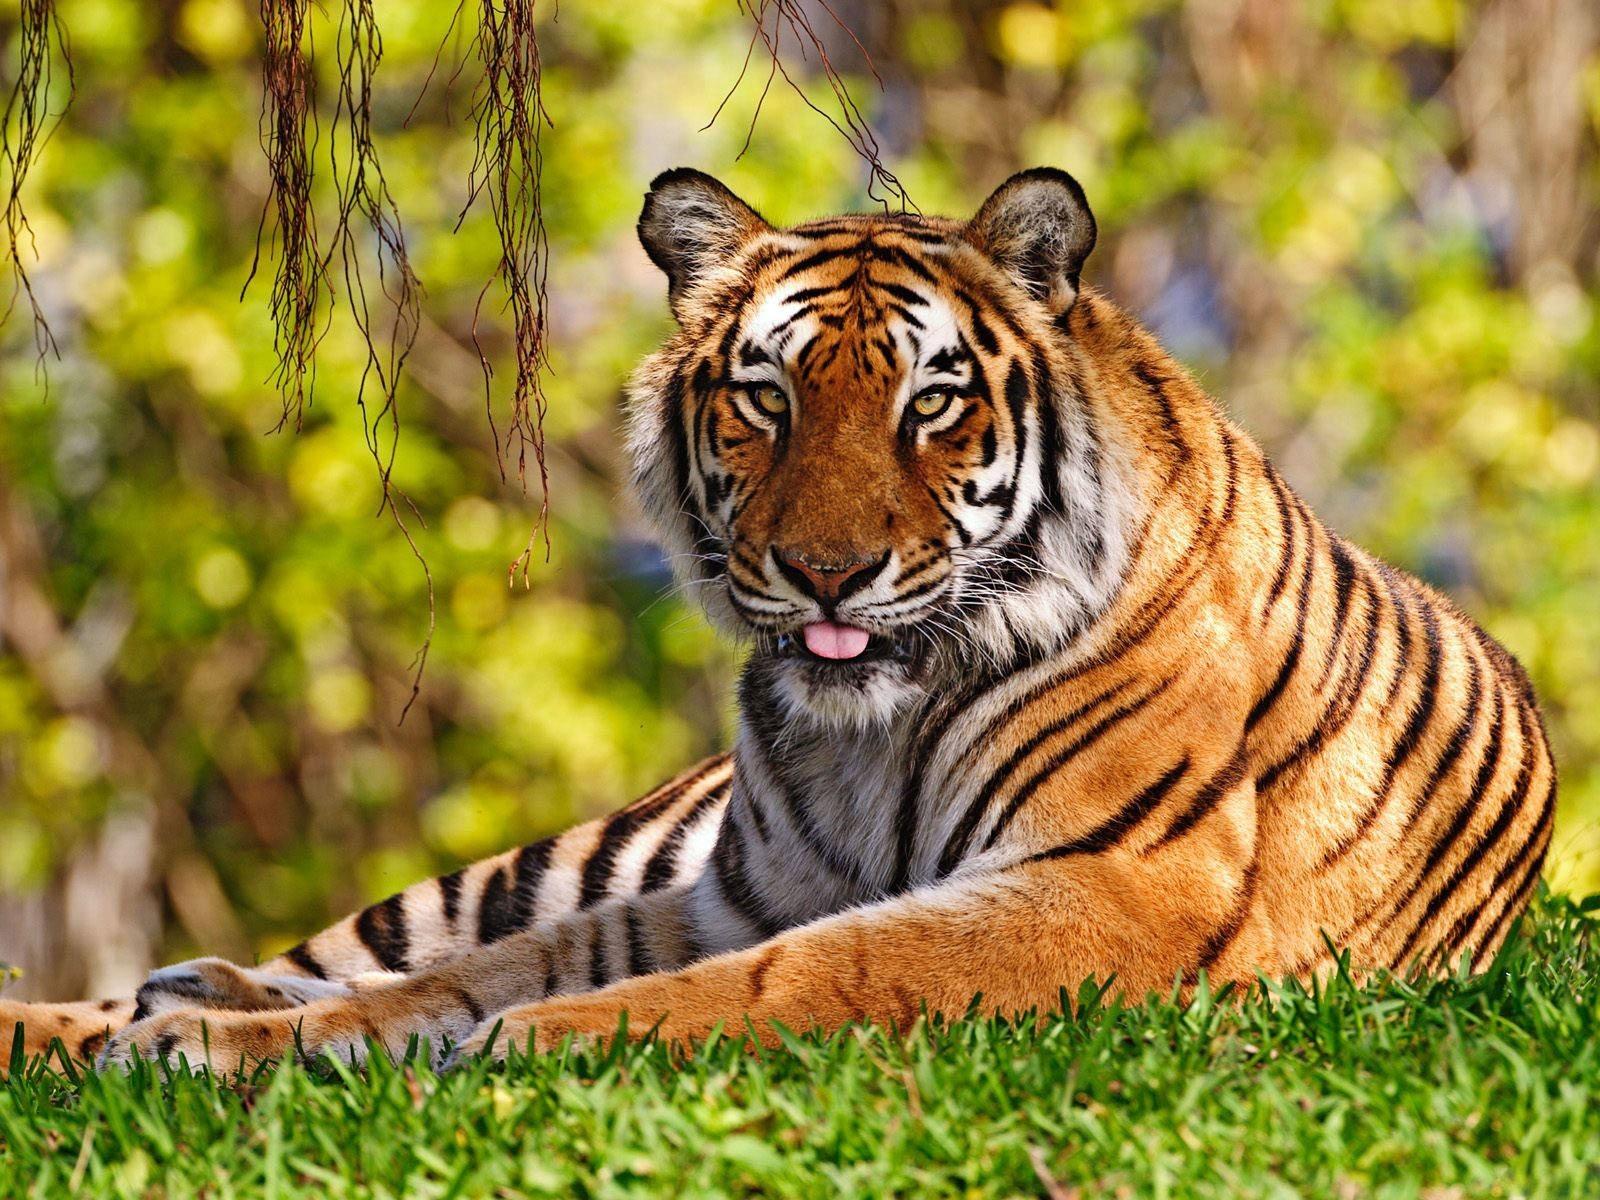 Best Desktop HD Wallpaper   Tiger HD wallpapers 1600x1200